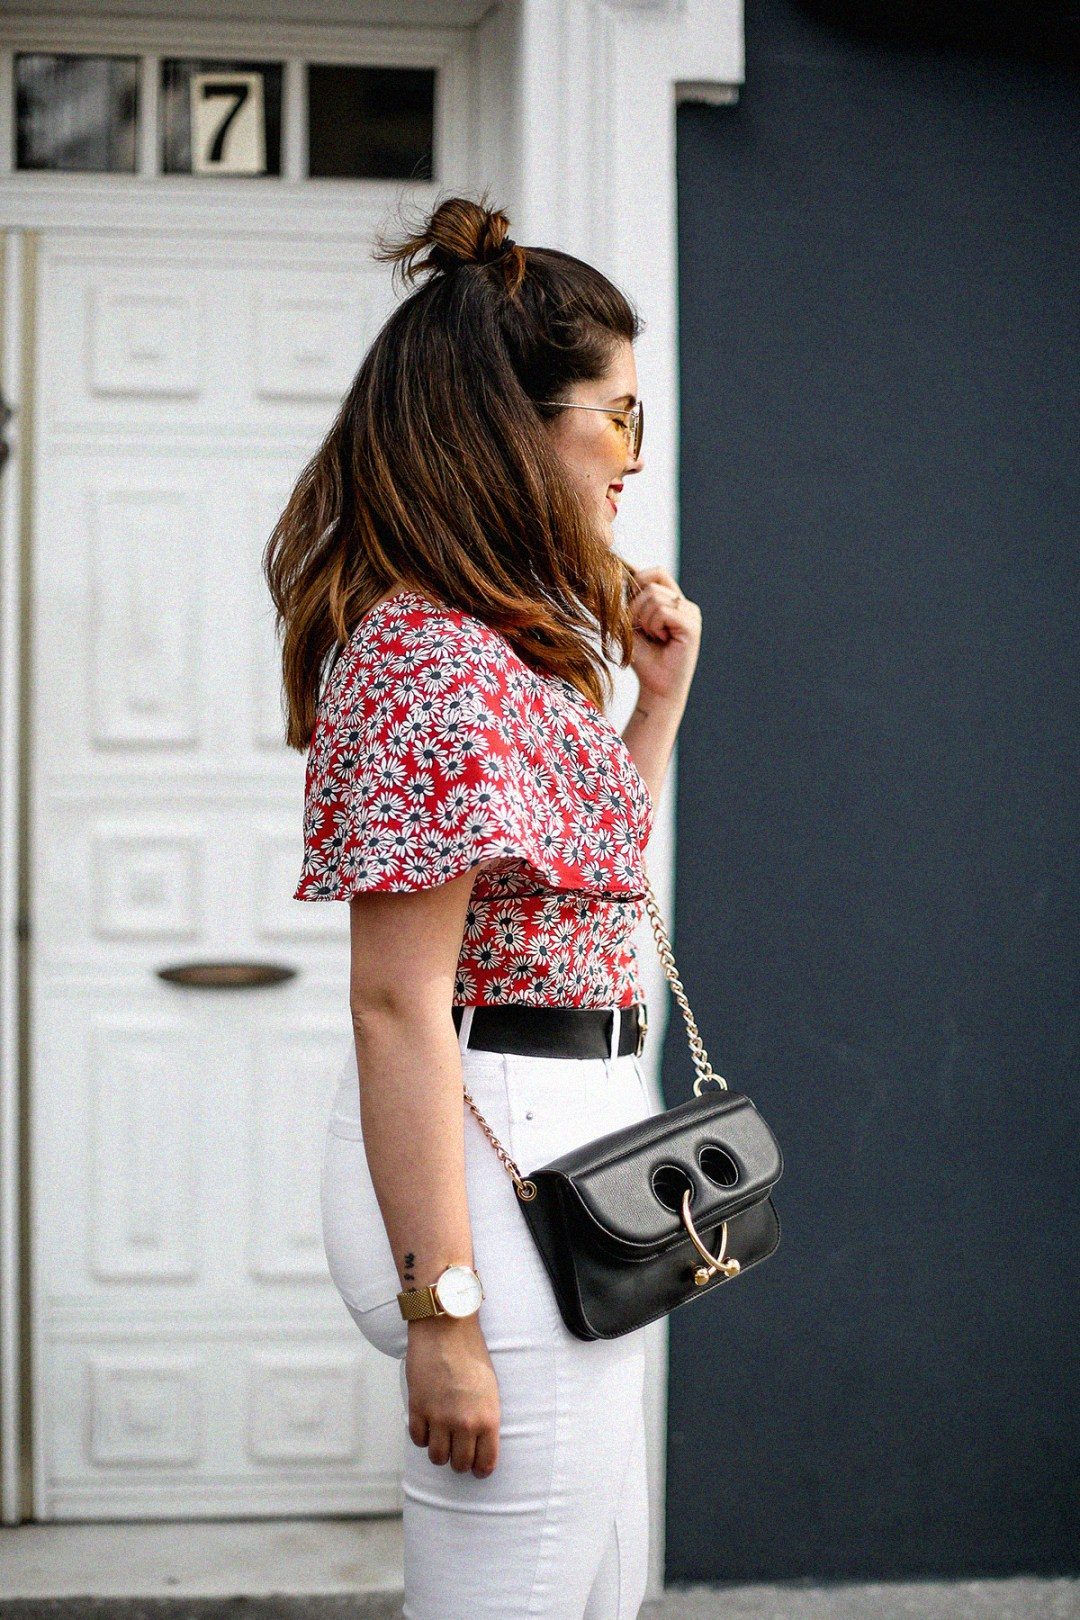 flower-top-zara-frayed-white-jeans-chanel-slingback-jw-anderson-bag-streetstyle3